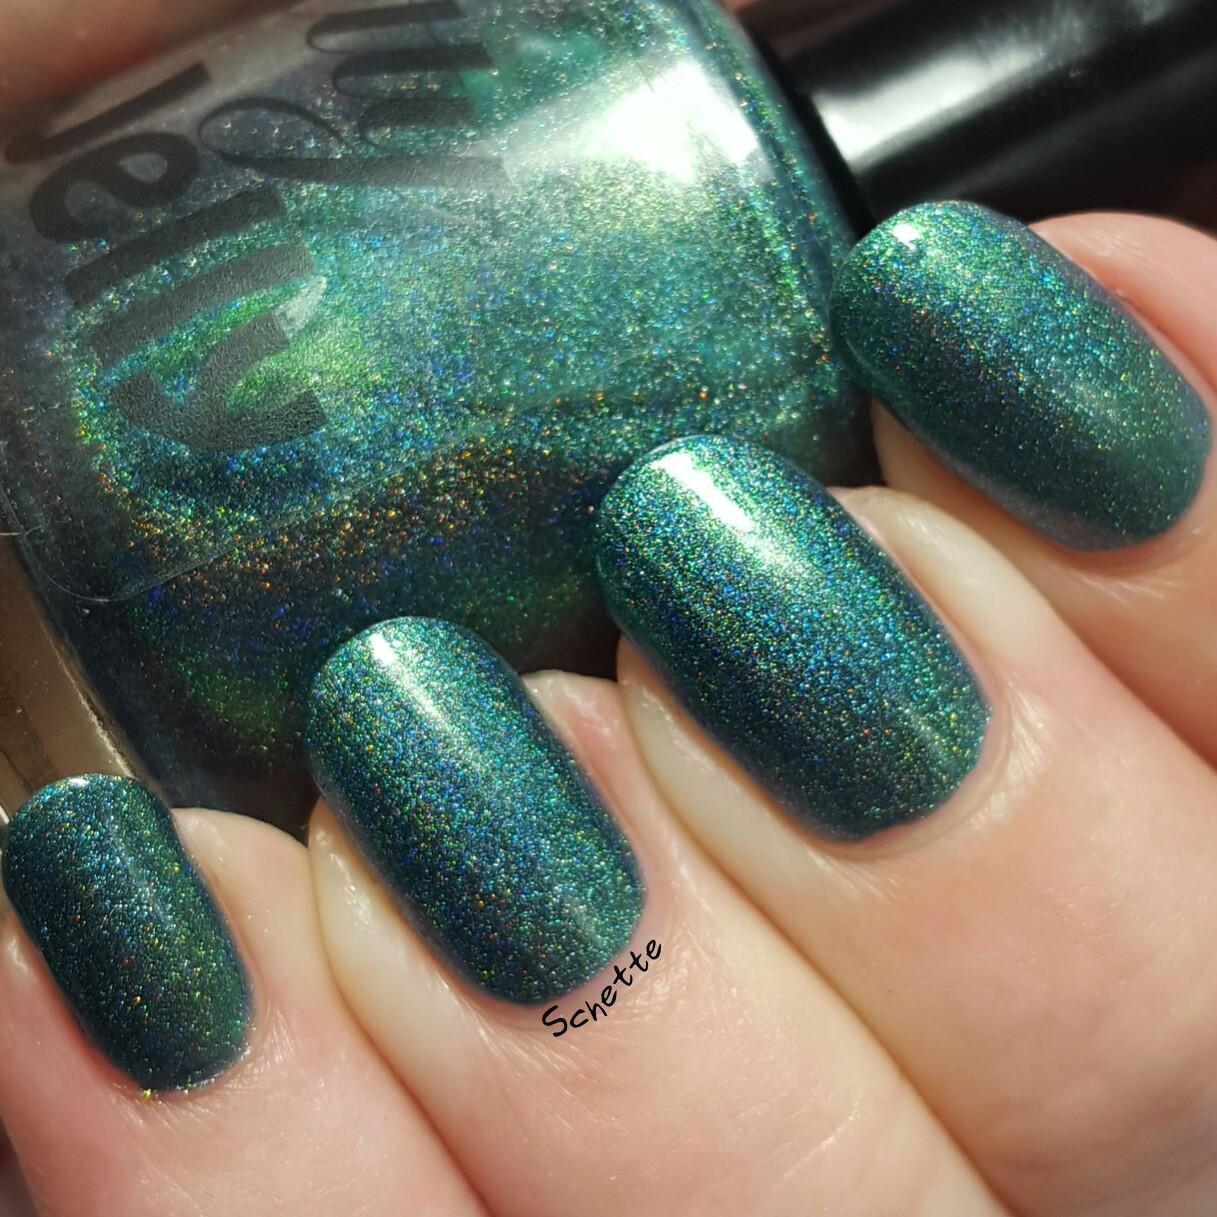 Pretty Jelly - Whirlpool